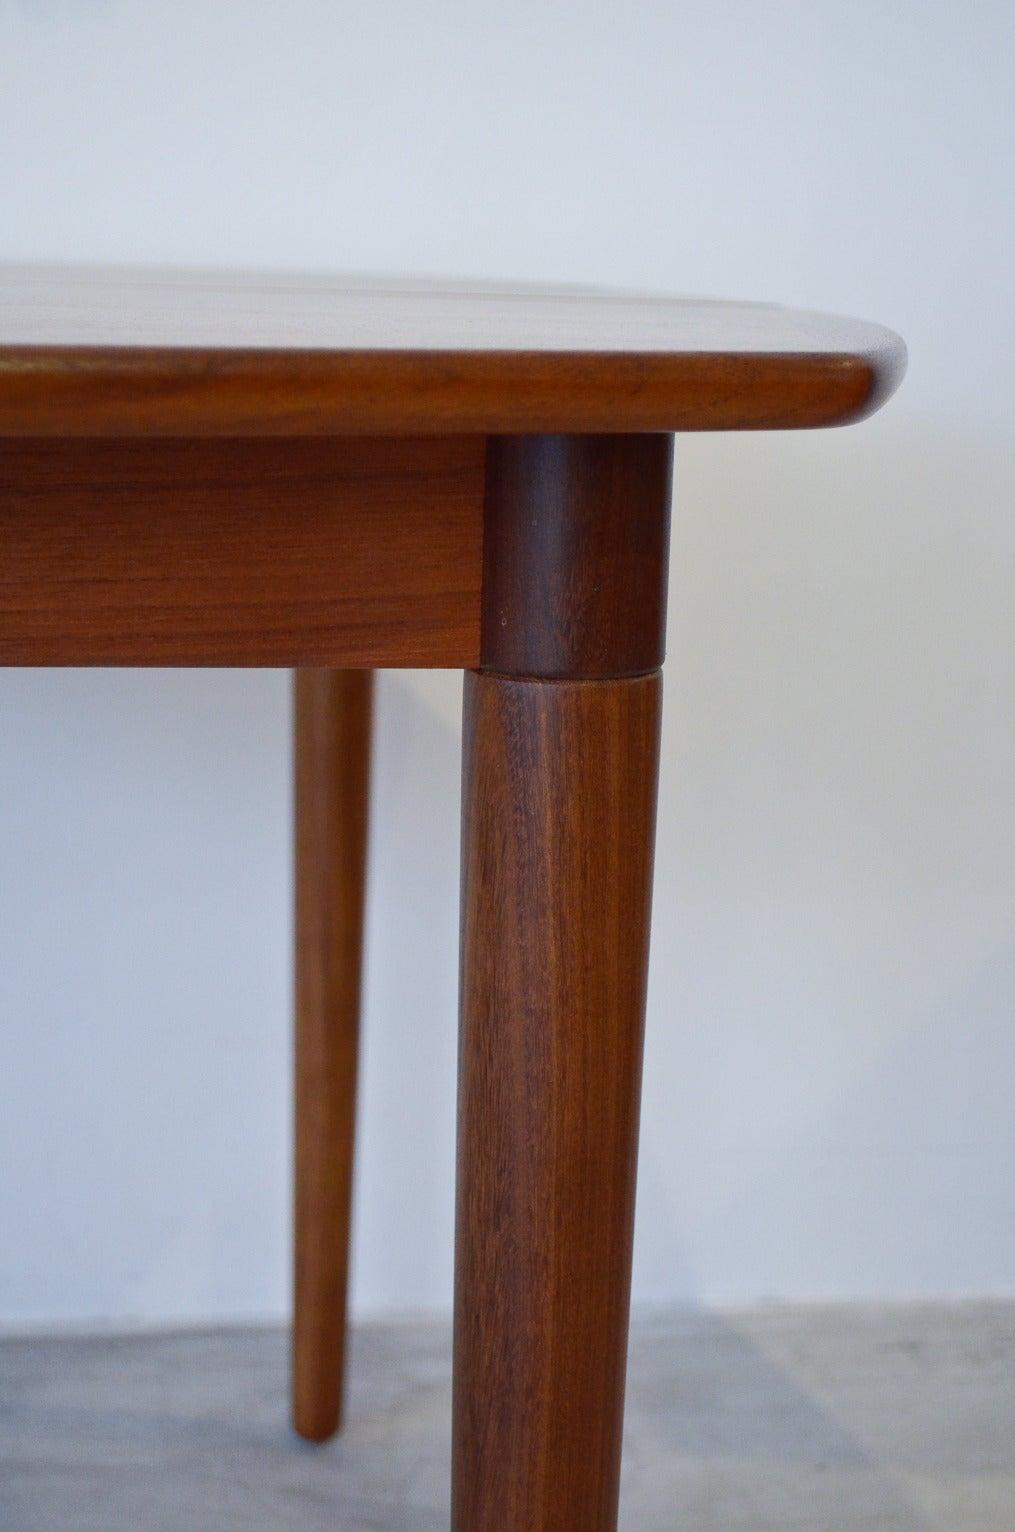 Danish Teak Dining Table By Koefoeds Hornslet At 1stdibs